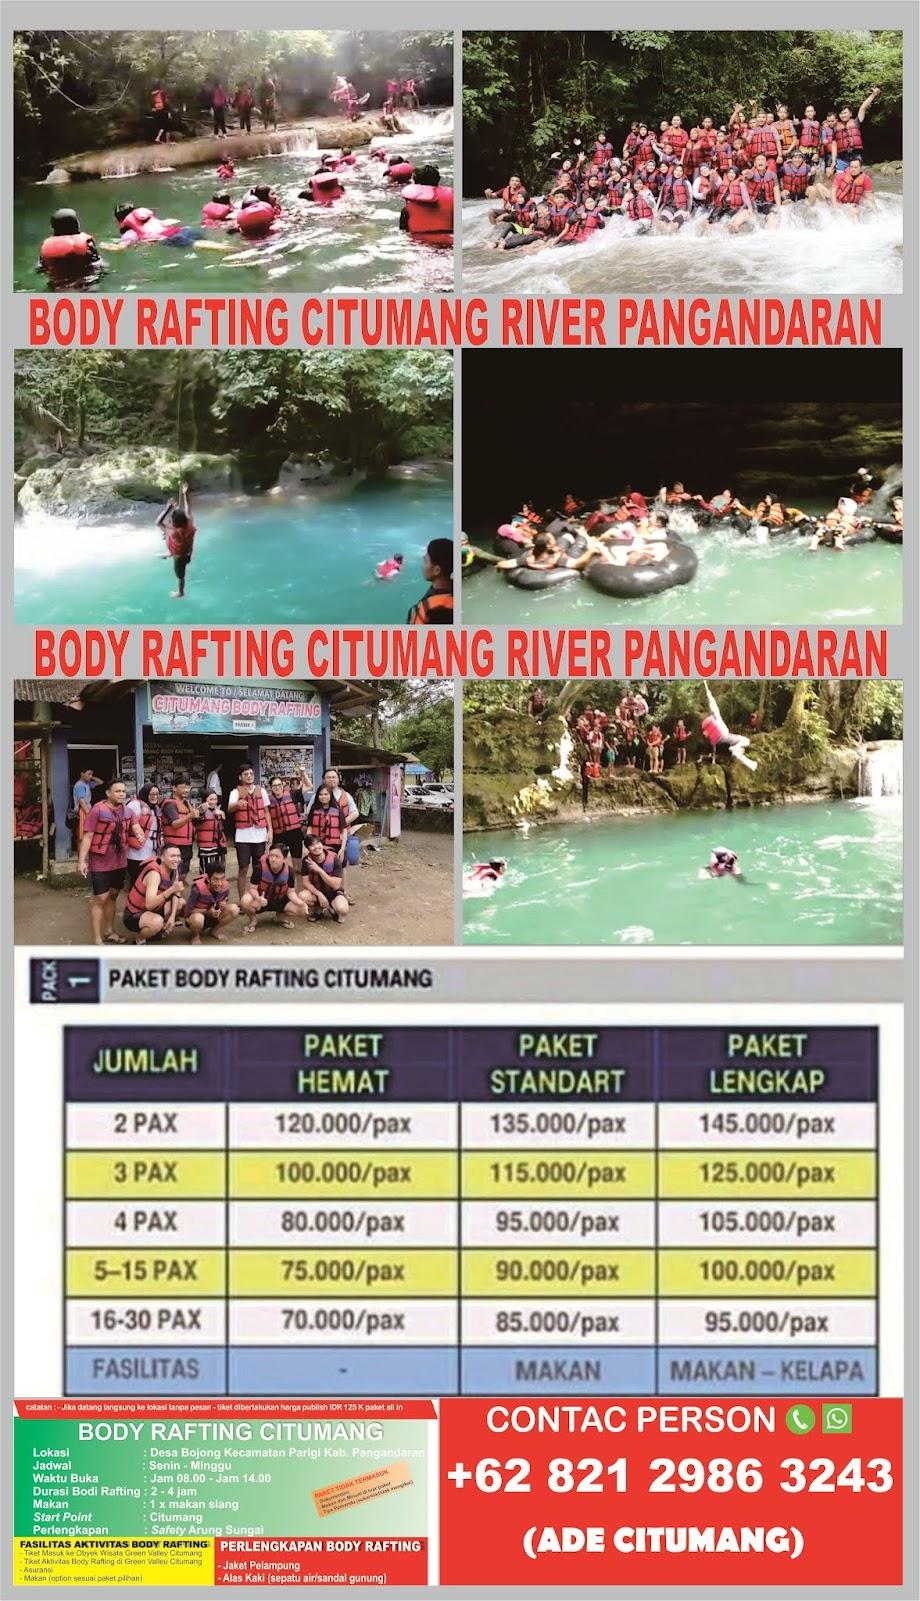 BODY RAFTING CITUMANG RIVER PANGANDARAN